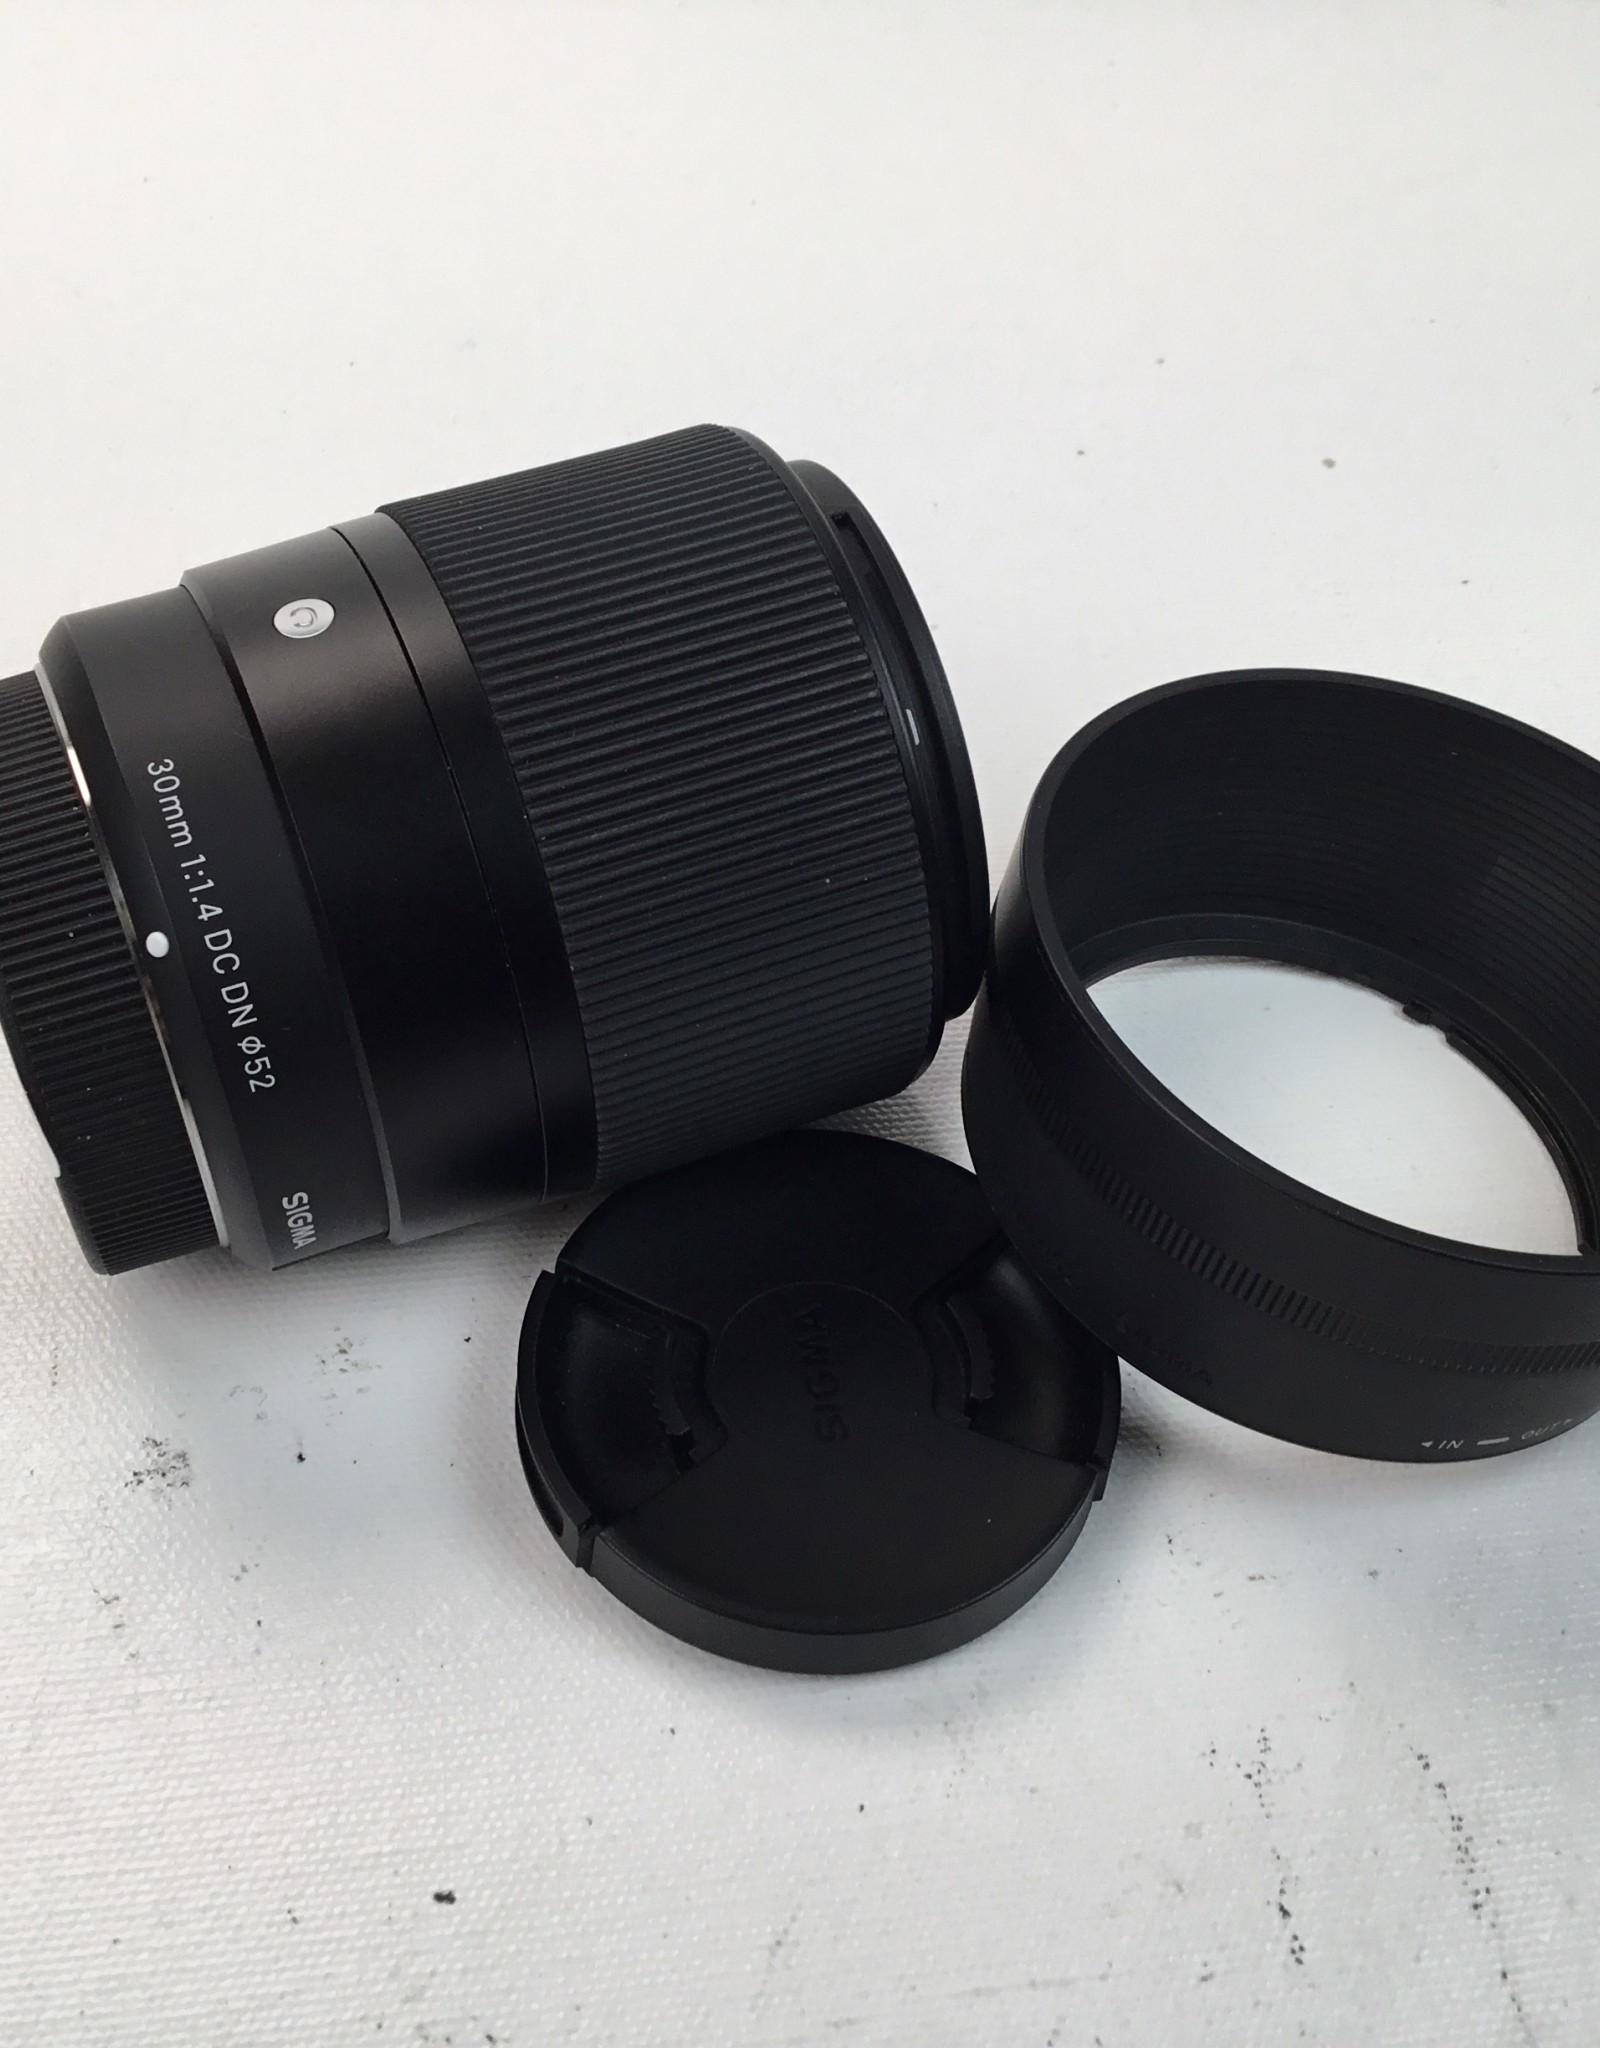 SIGMA Sigma 30mm f1.4 DC DN Micro 4/3 Lens Used EX+